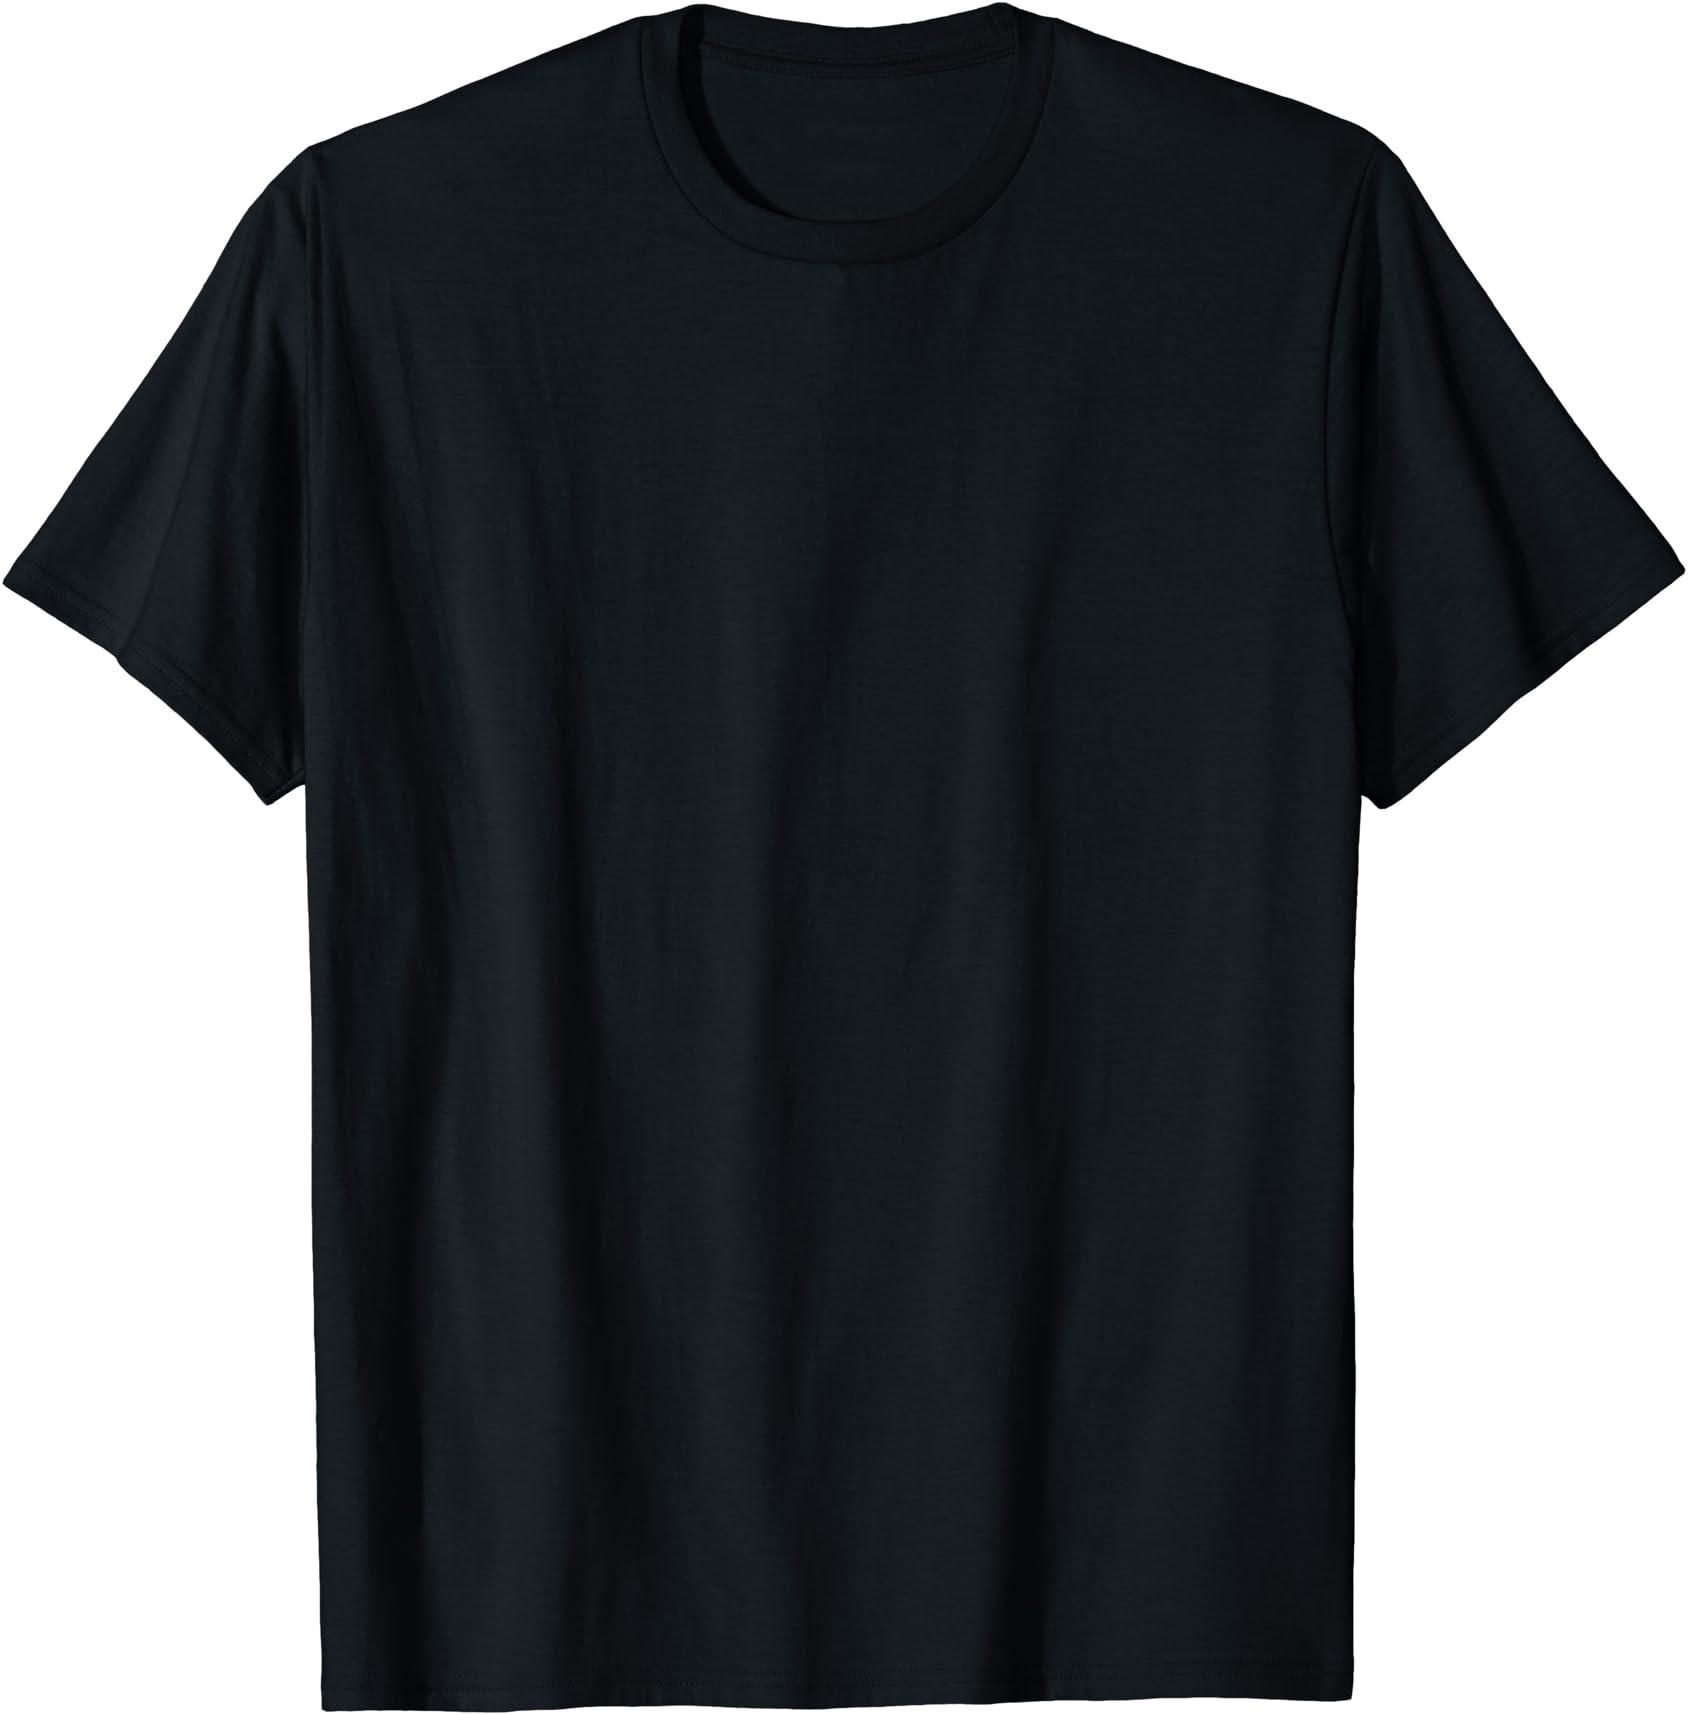 Always Be A Turtle Mens Short Sleeve T-Shirt Print Tees Tops